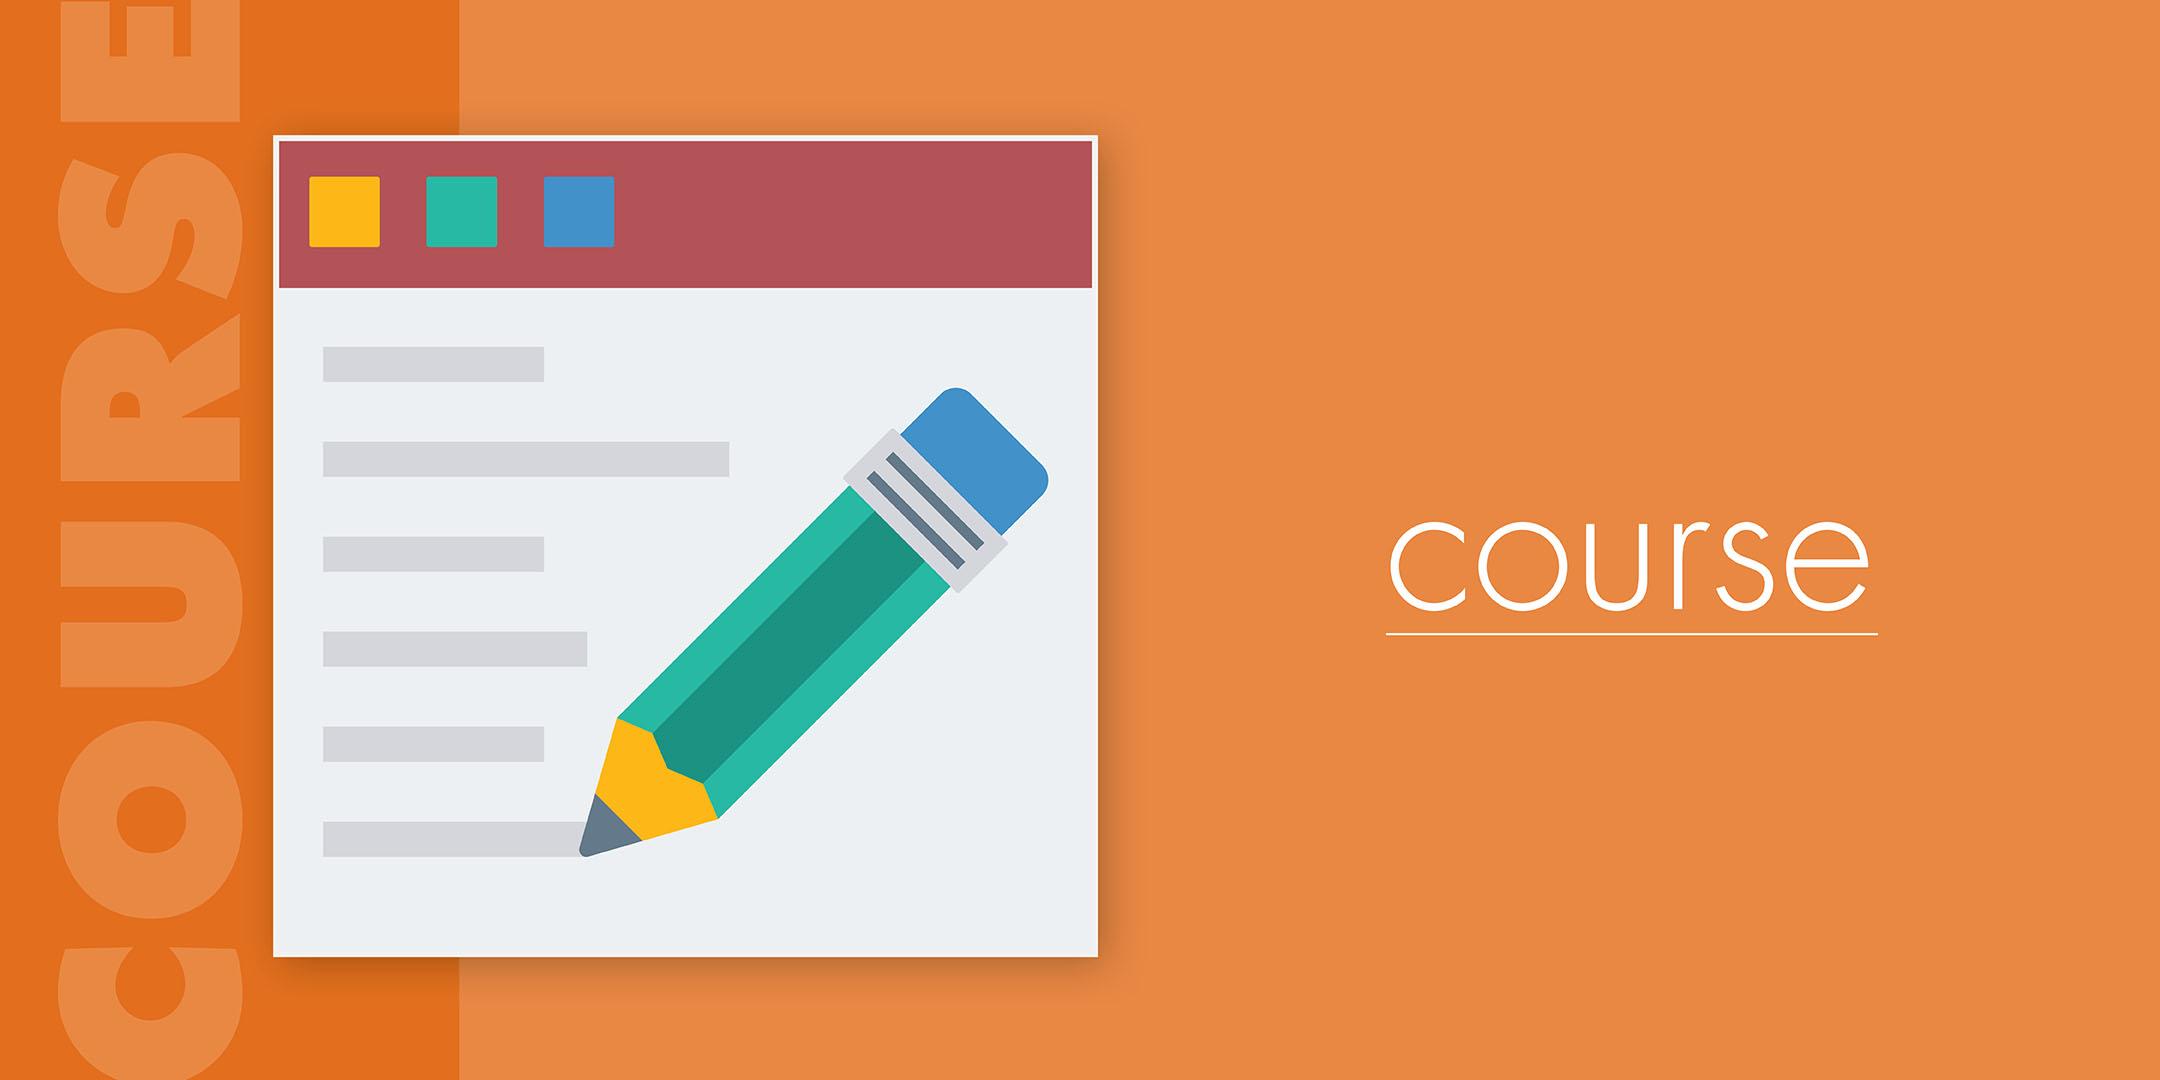 CQE Exam Prep Course 3256